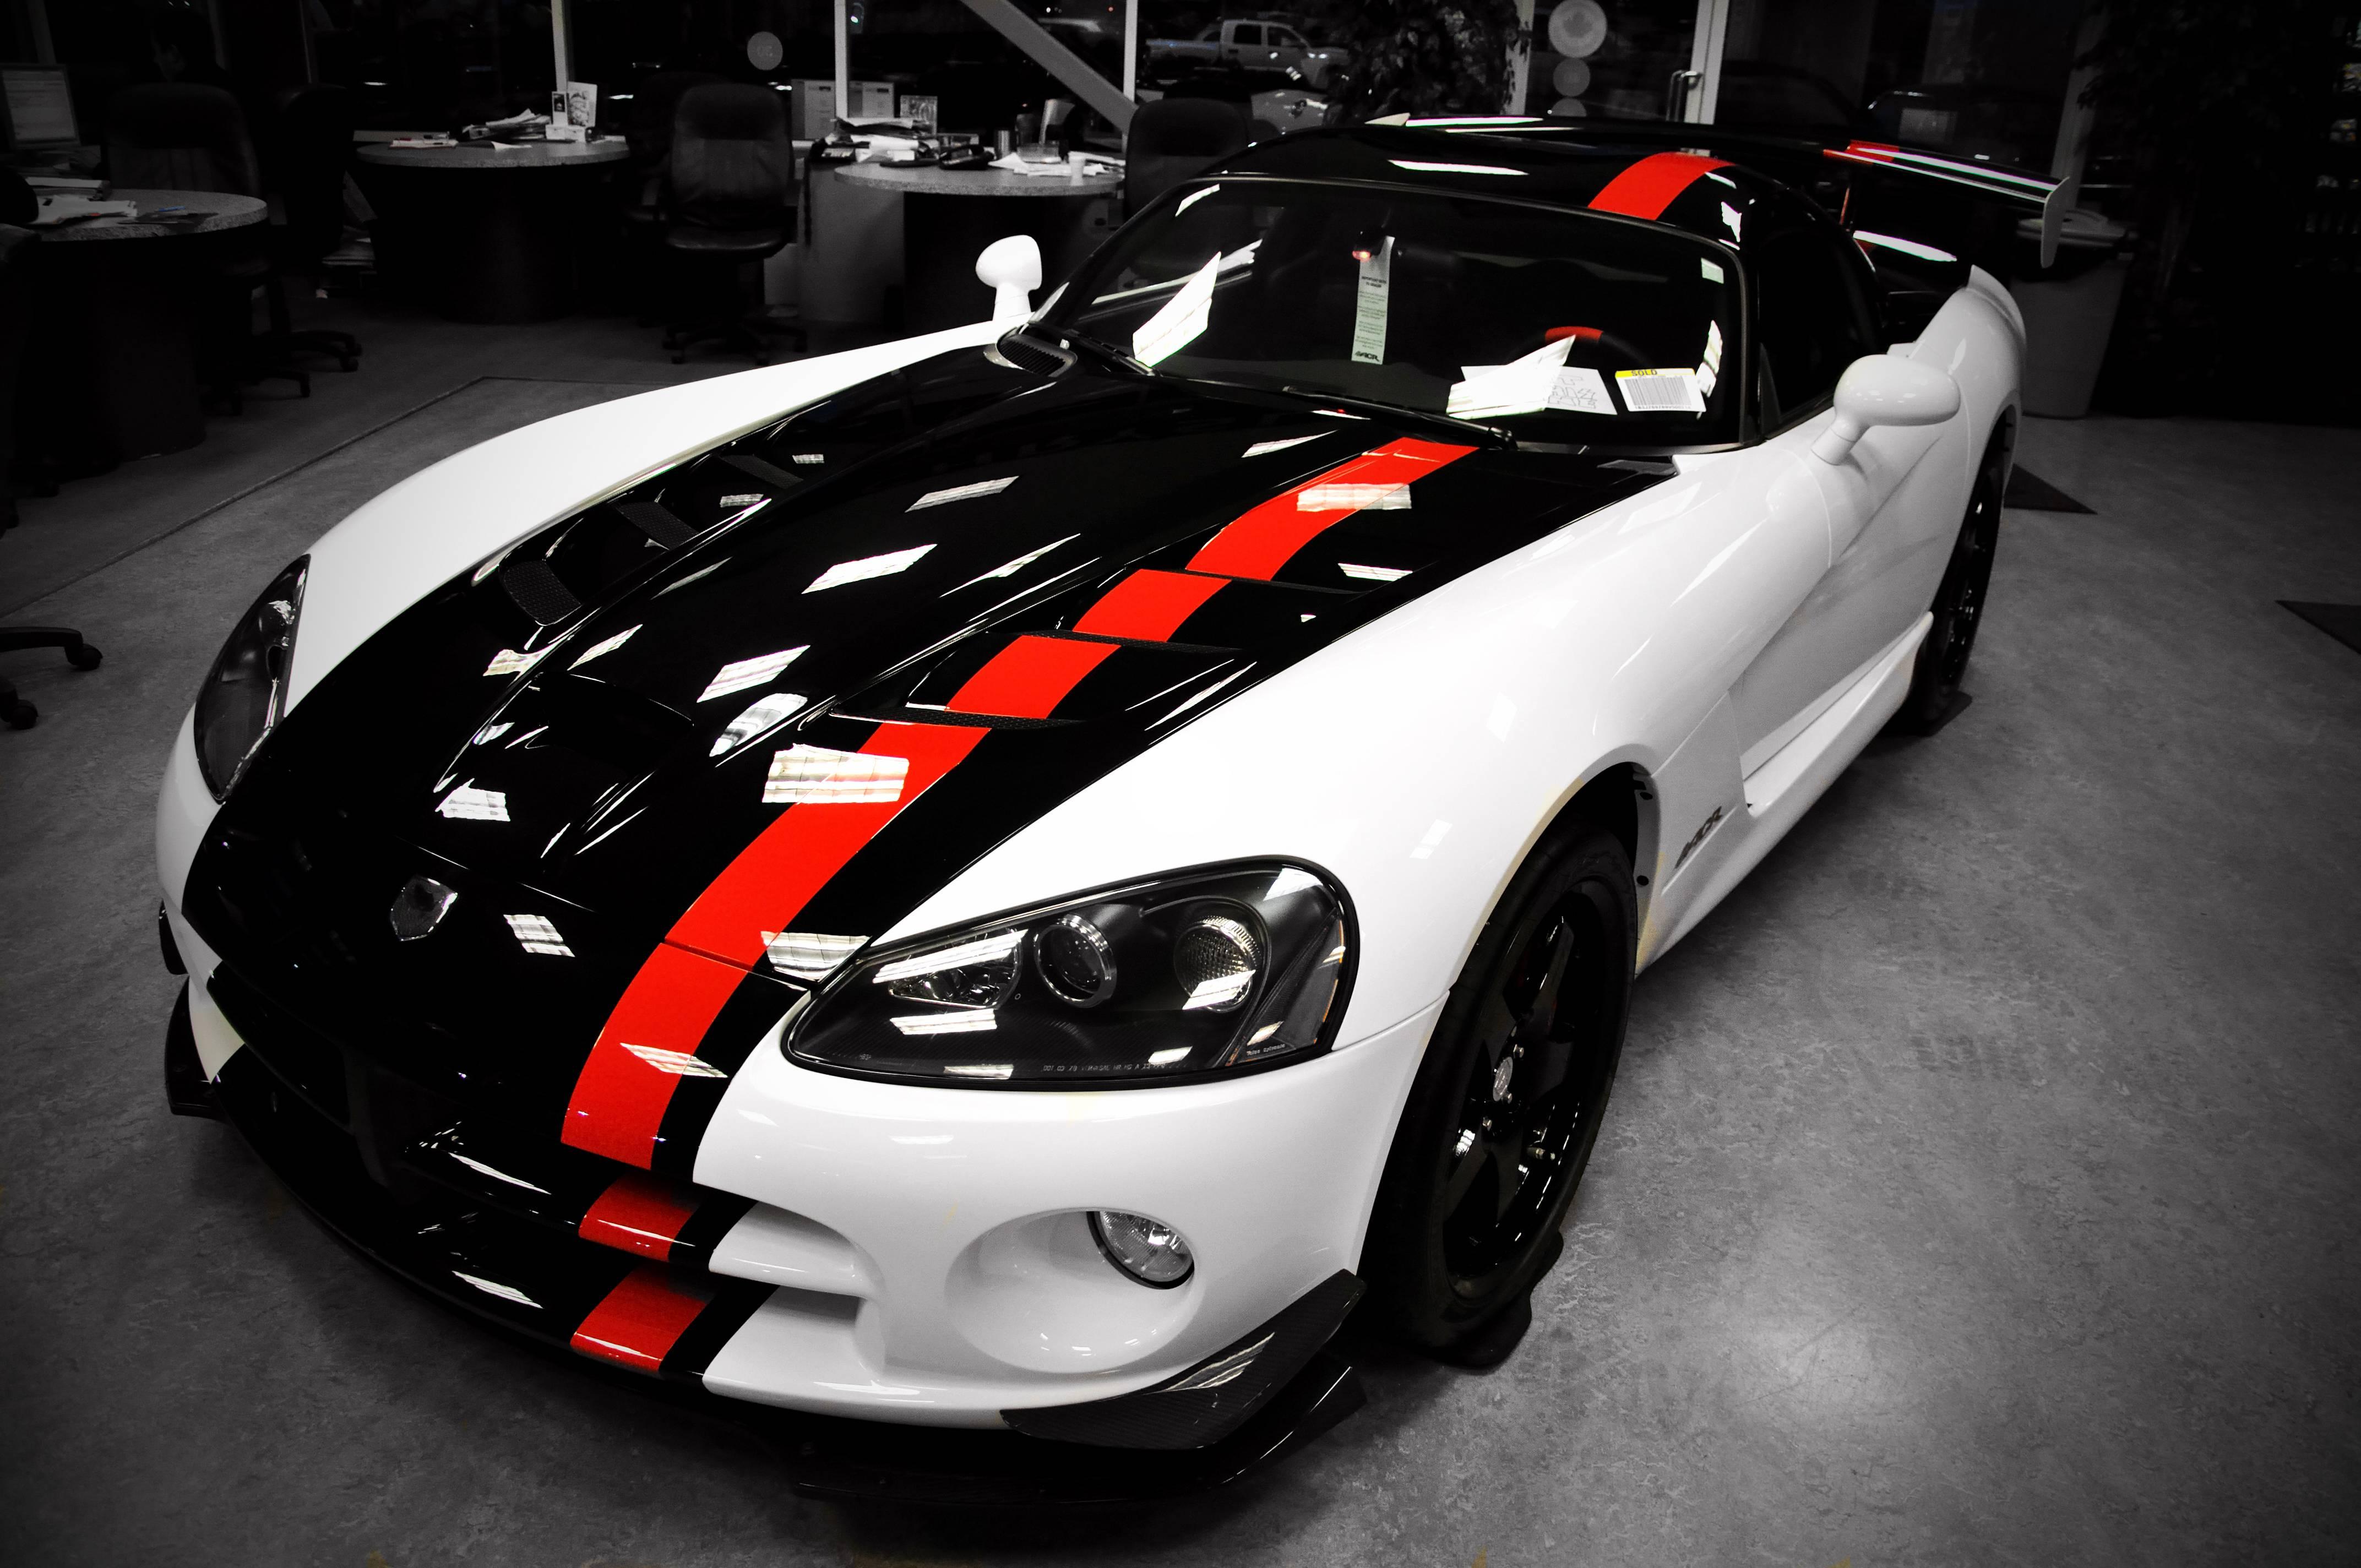 Black White Dodge Viper Tuning Car 1 Wallpaper | Background Download